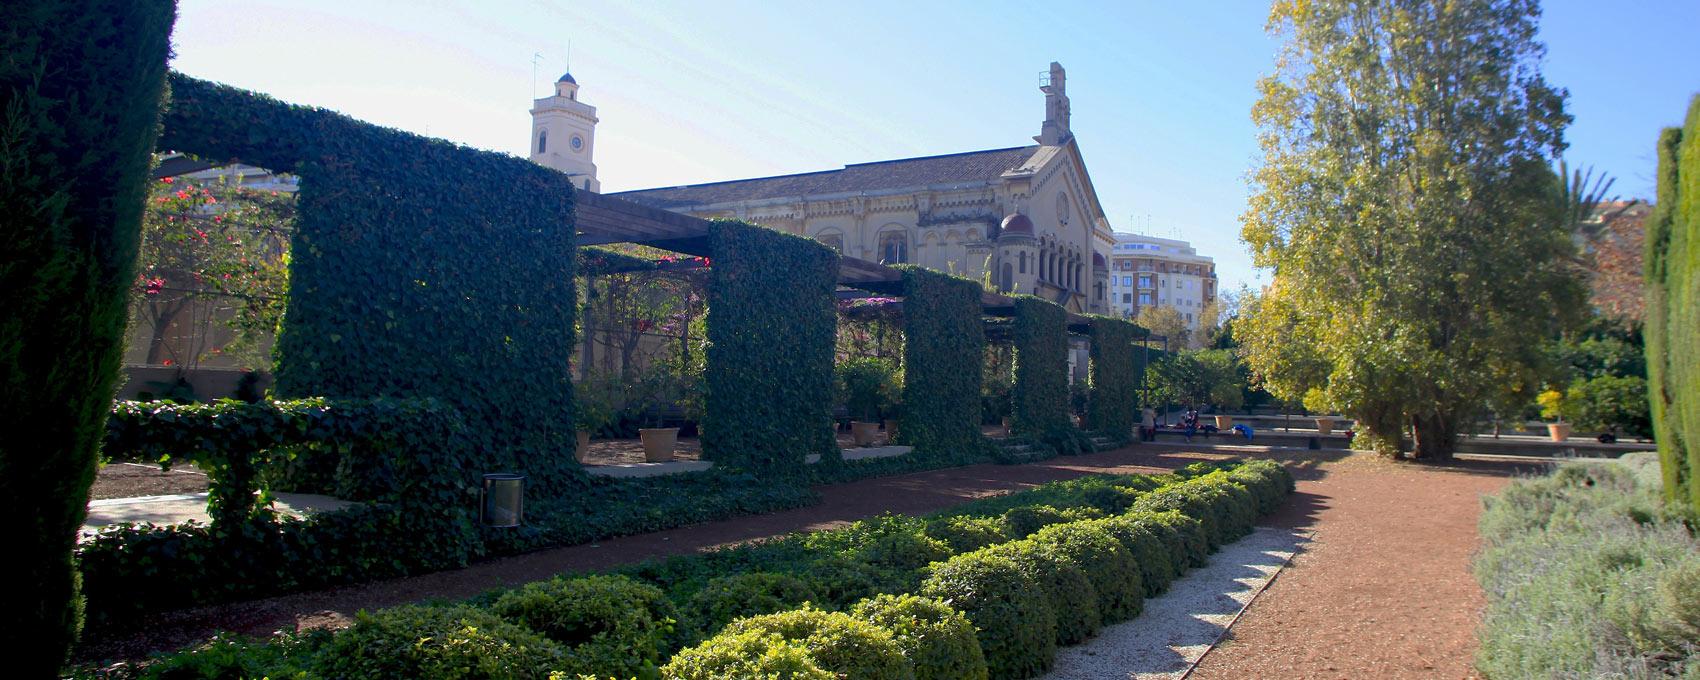 Ubicada en una cantonada del jardí, ofereix un espai diferenciat de la resta